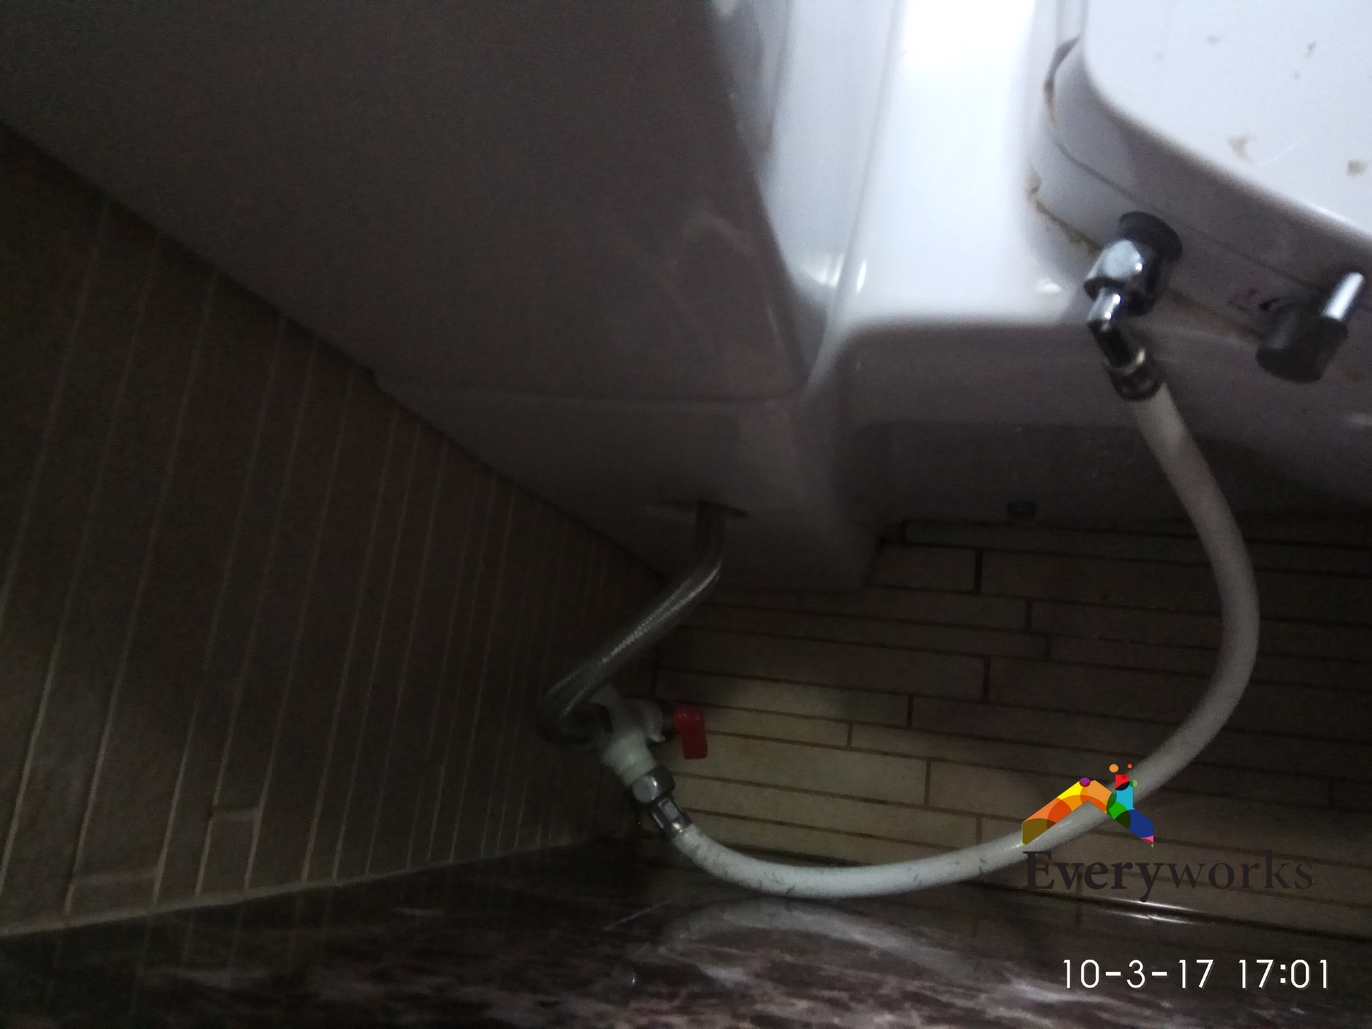 Clear-Toilet-Bowl-Choke-Drainage-Pipe-Choke-Plumber-Singapore-Landed-Sembawang-1_wm